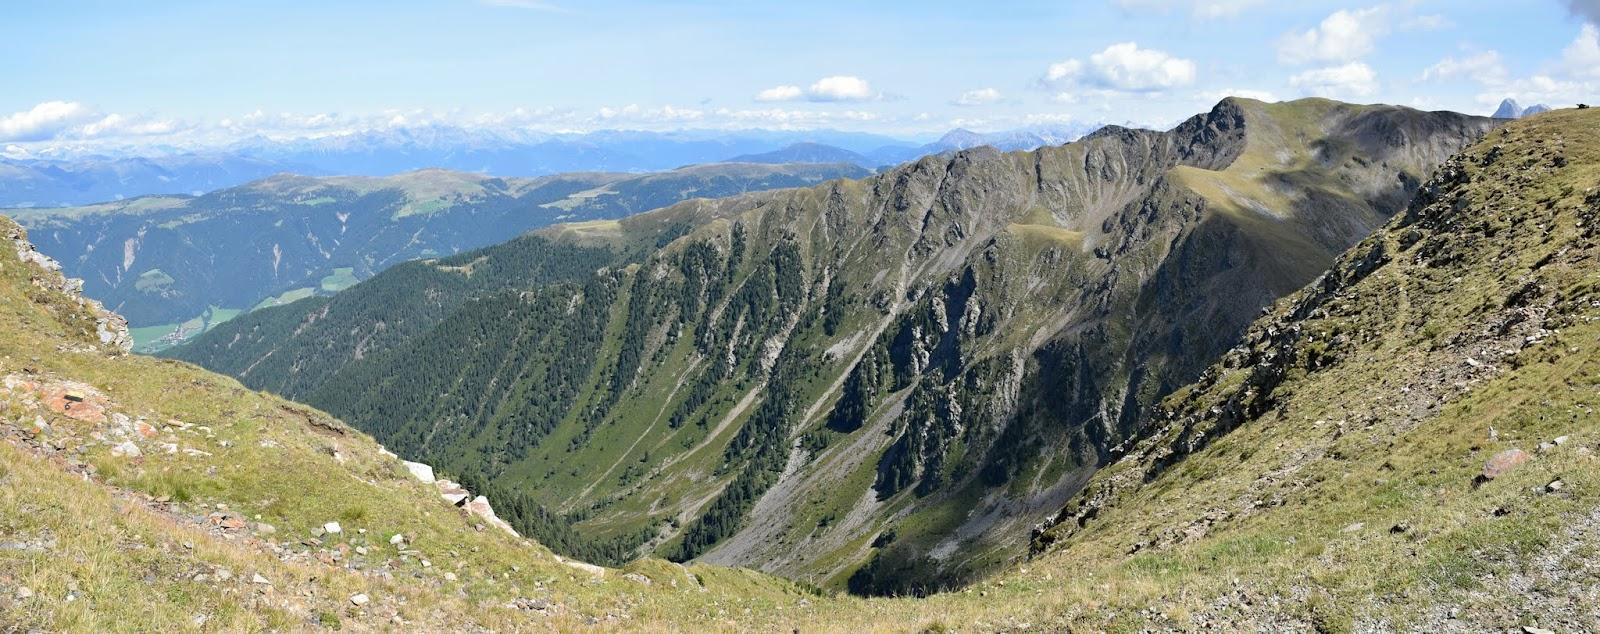 22.8. Z Brixen Plose, Rossalm -70.jpg